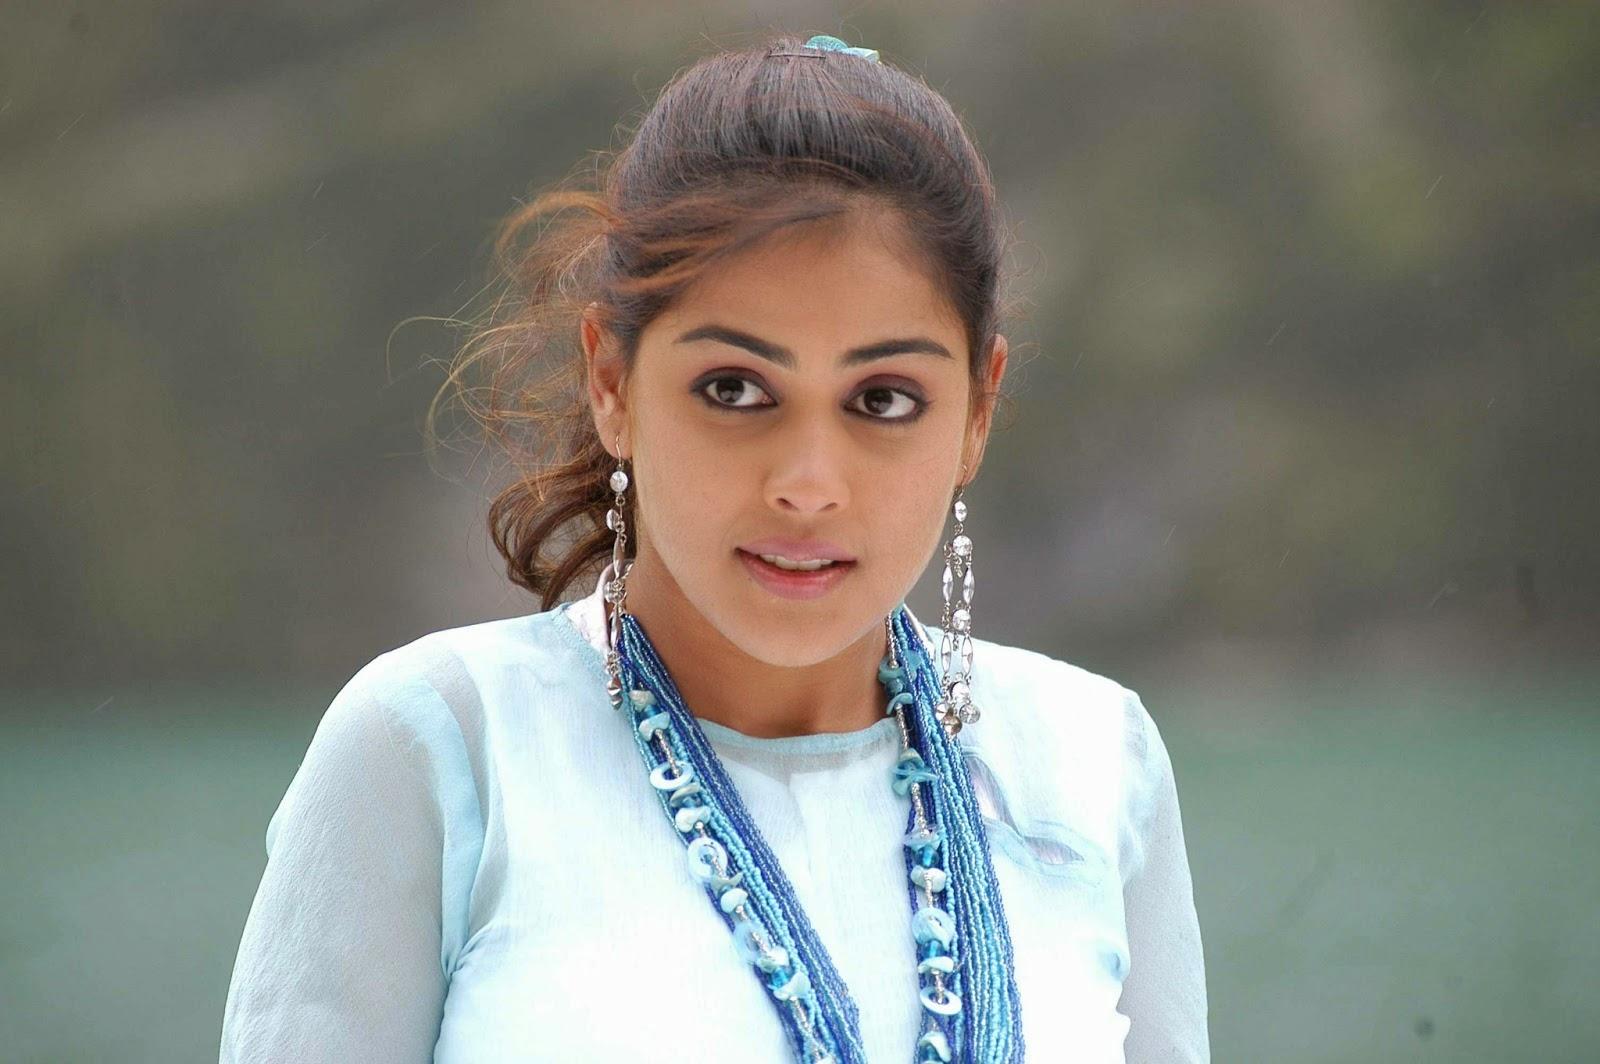 Bollywood Actress Hd Desktop Wallpaper South Indian: South Indian Actress HD Wallpapers